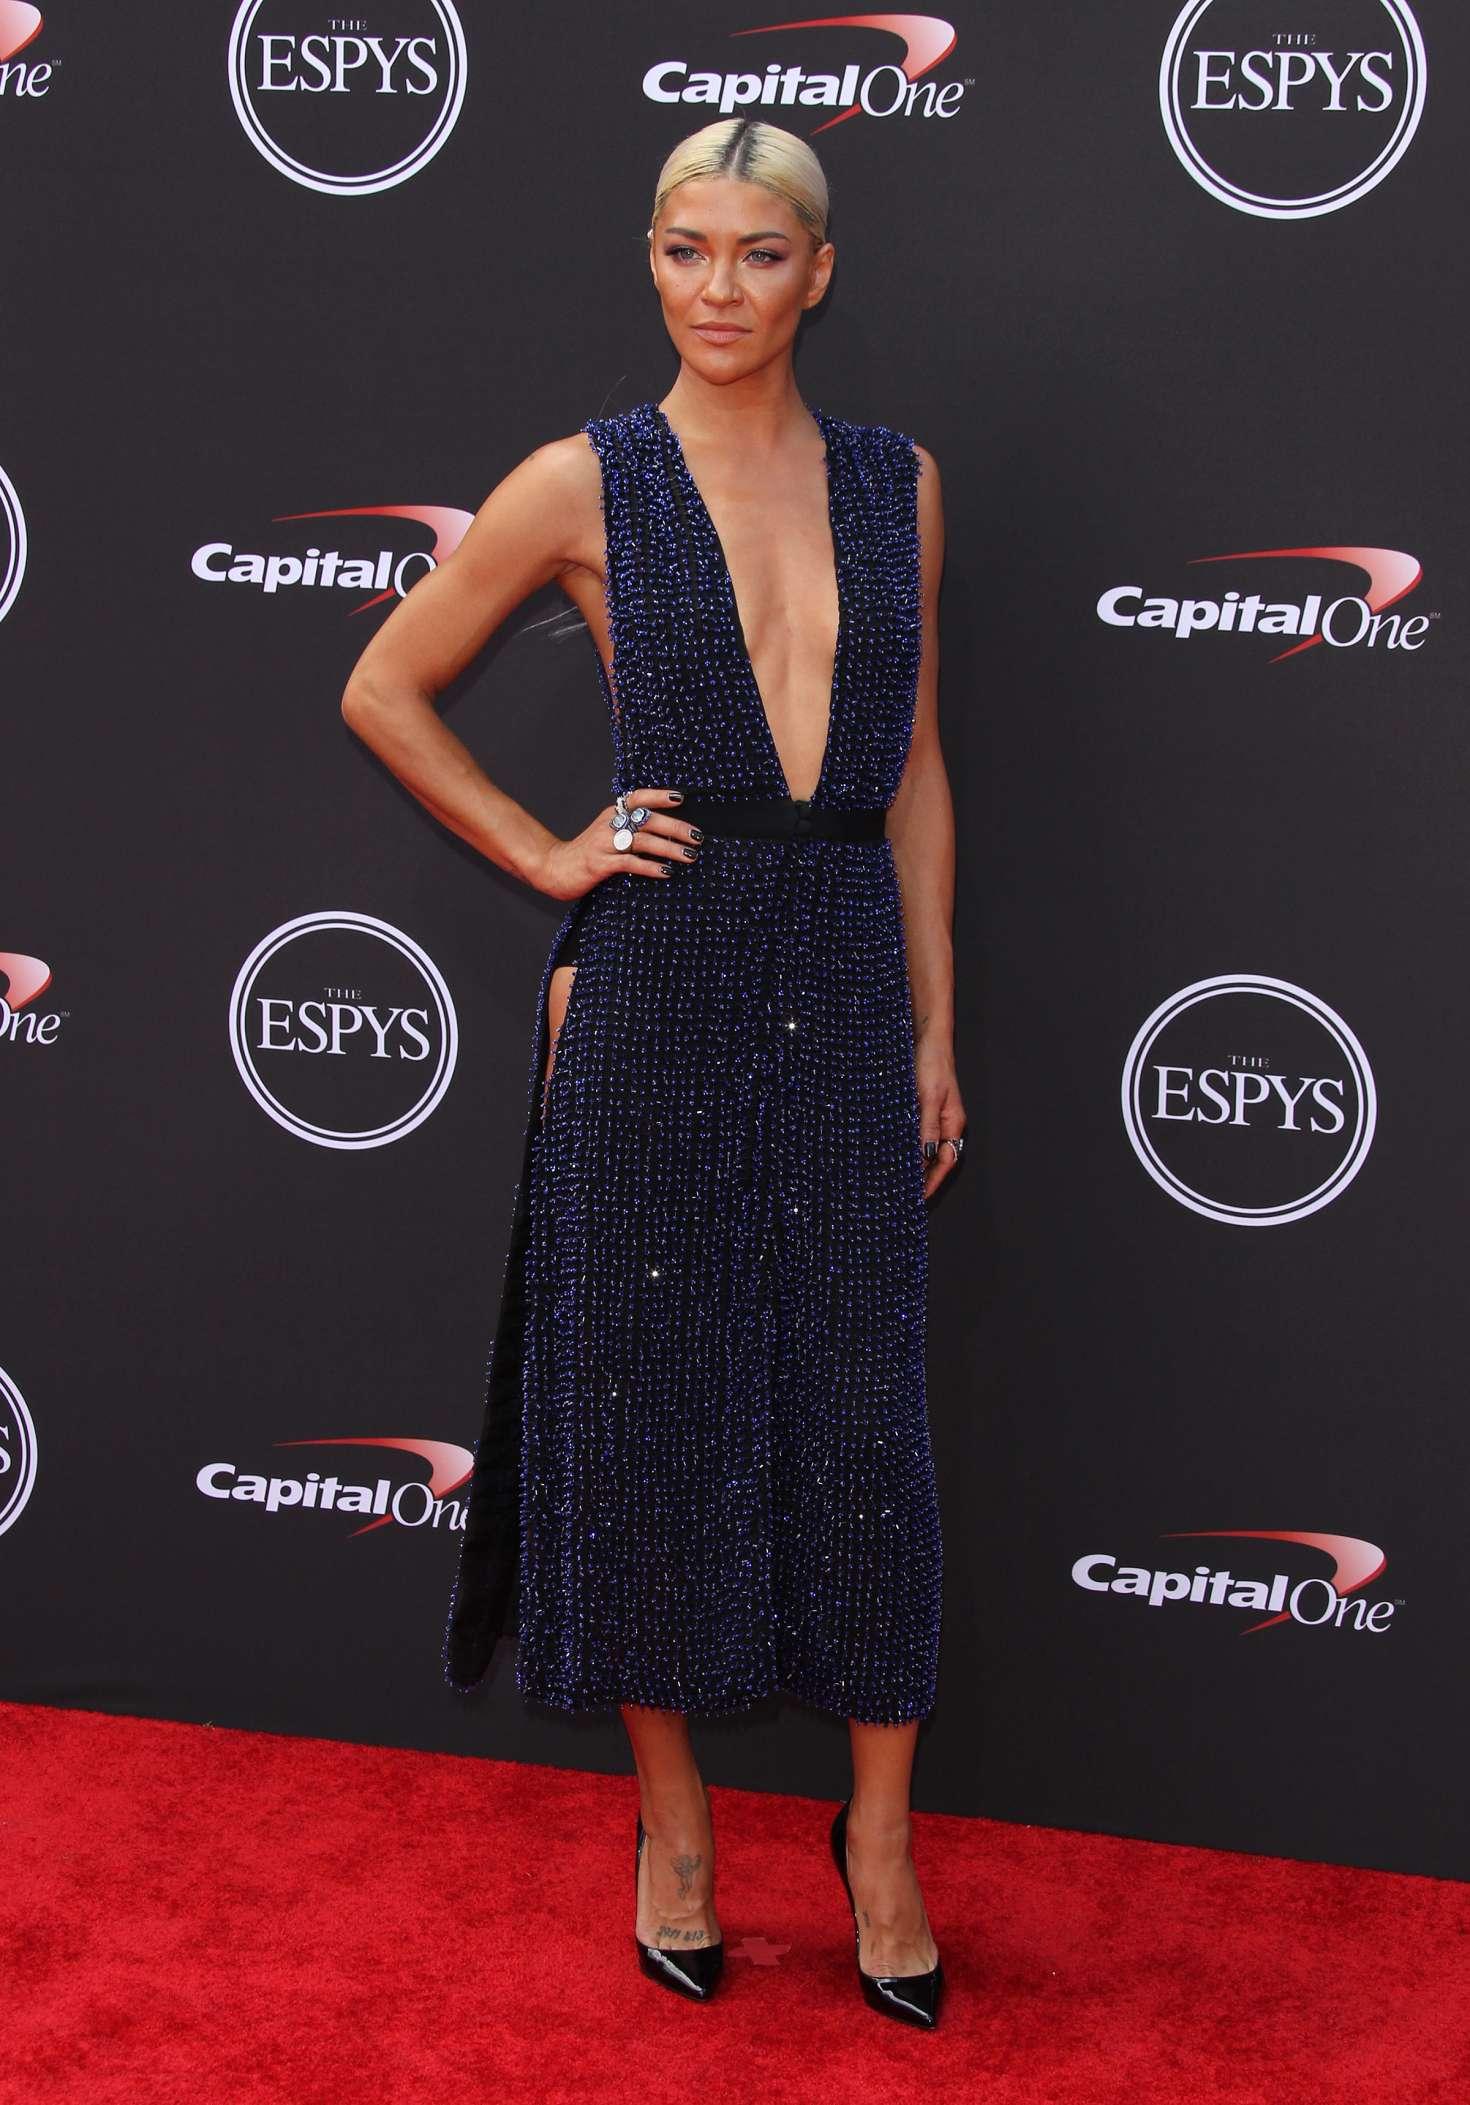 Vanessa Hudgens >> Jessica Szohr - 2018 ESPY Awards in Los Angeles